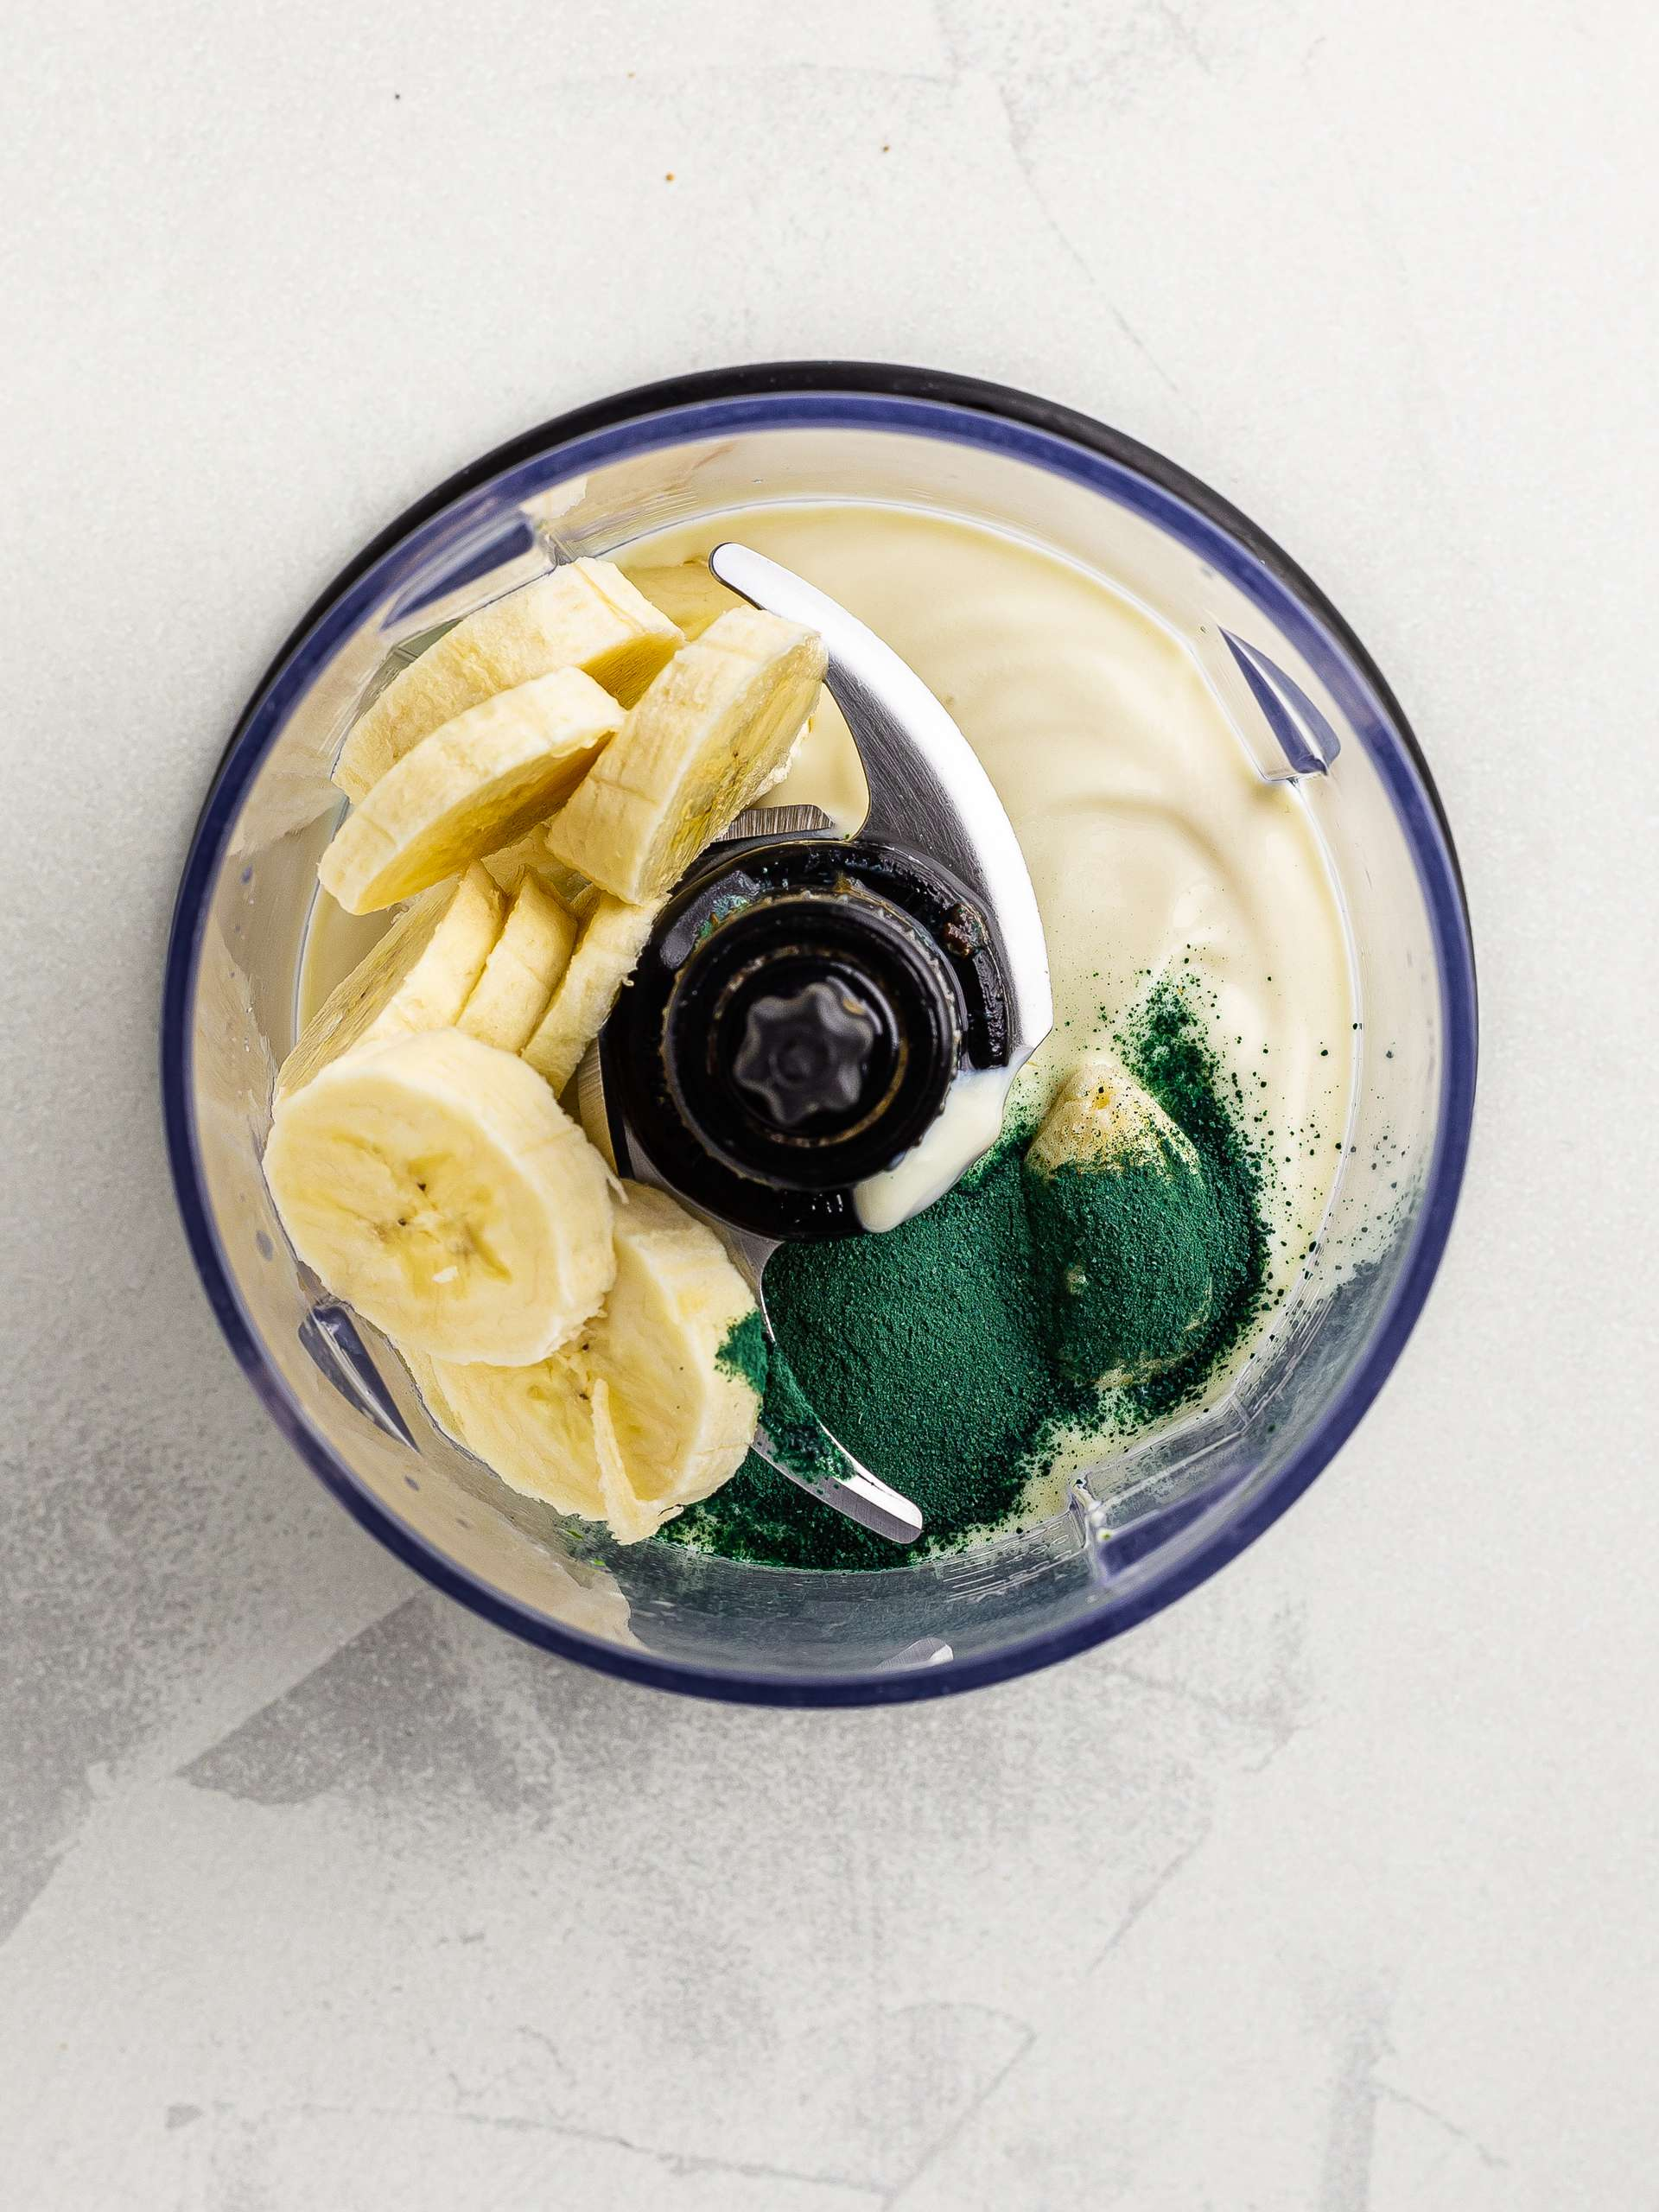 banana, yogurt and spirulina in a blender